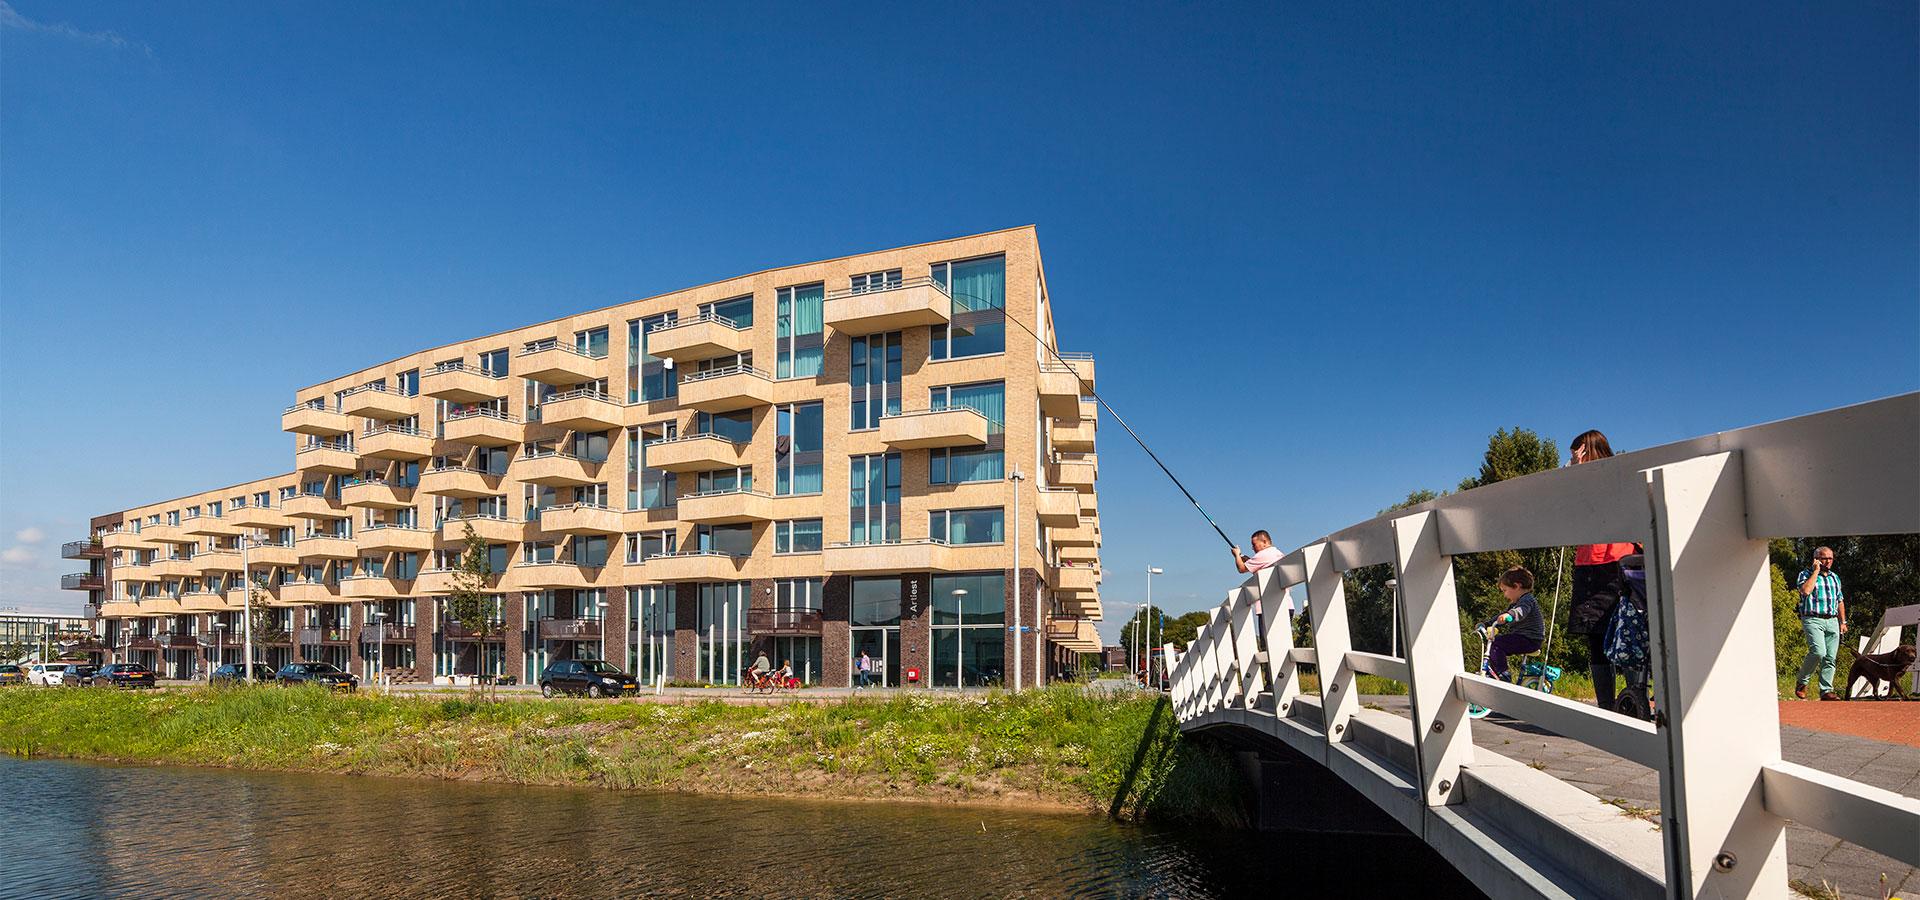 FARO architecten 't Zand Leidsche Rijn Utrecht 01